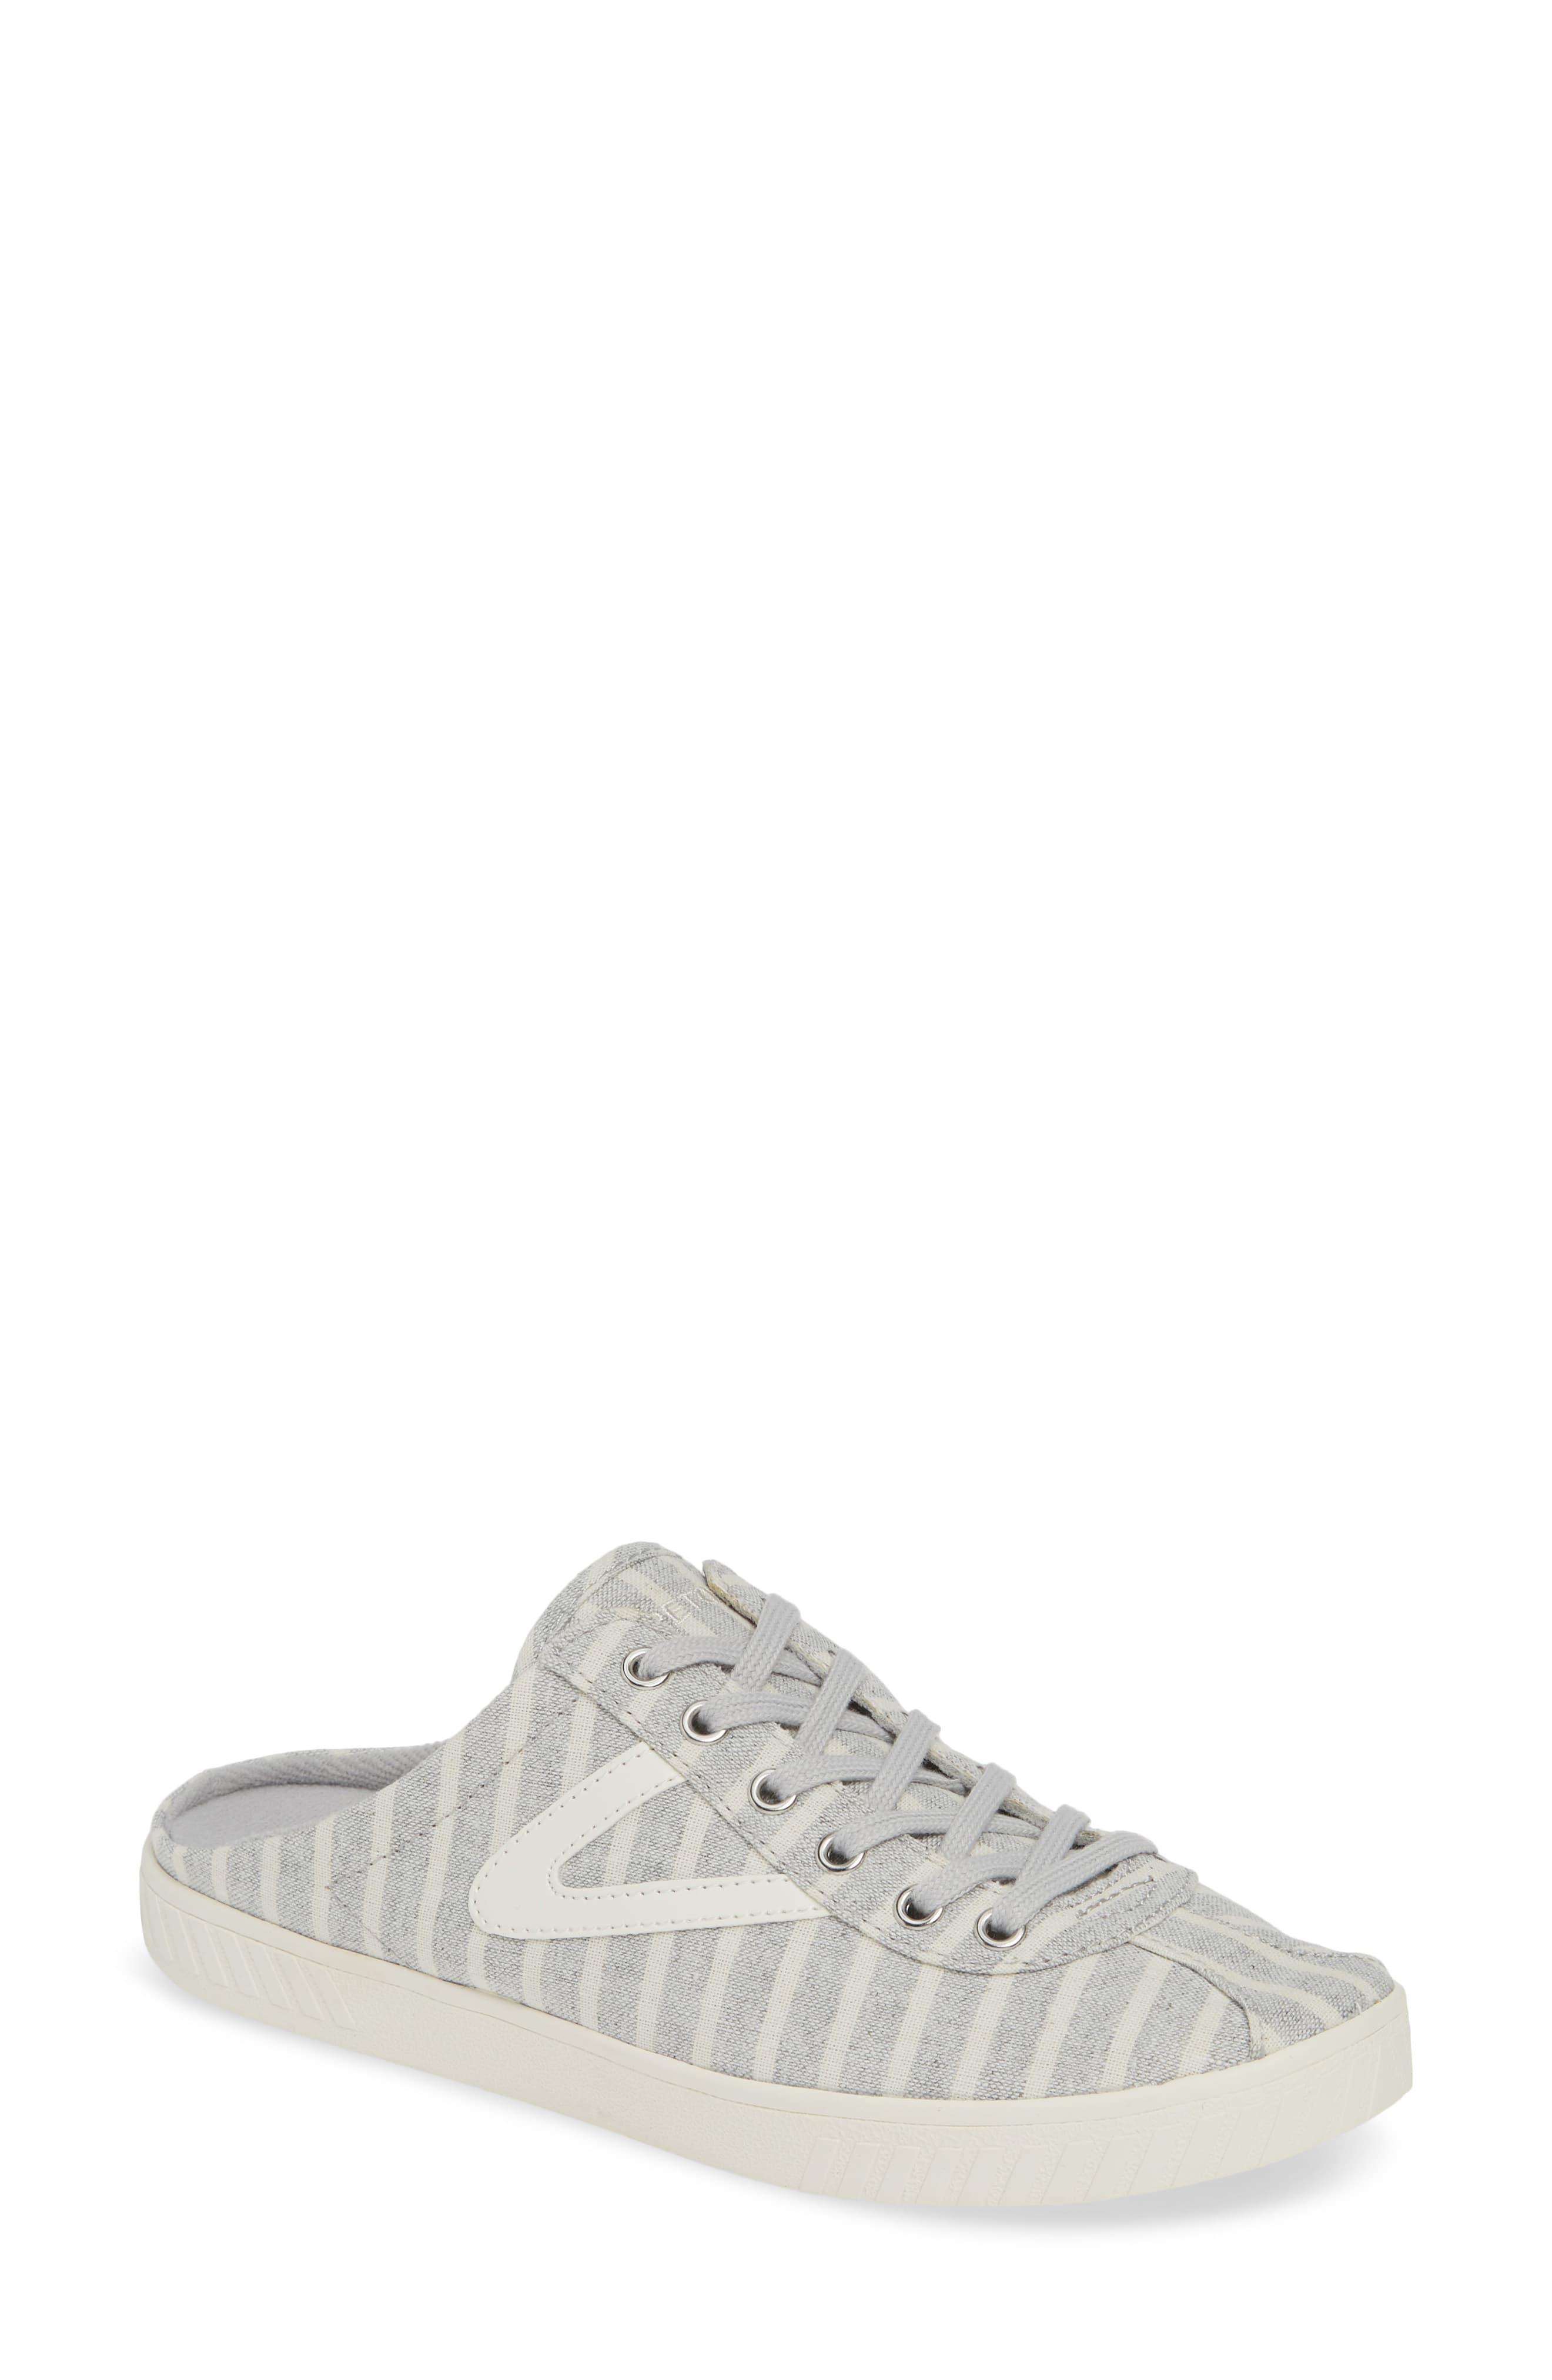 Tretorn Womens Cam Sneaker